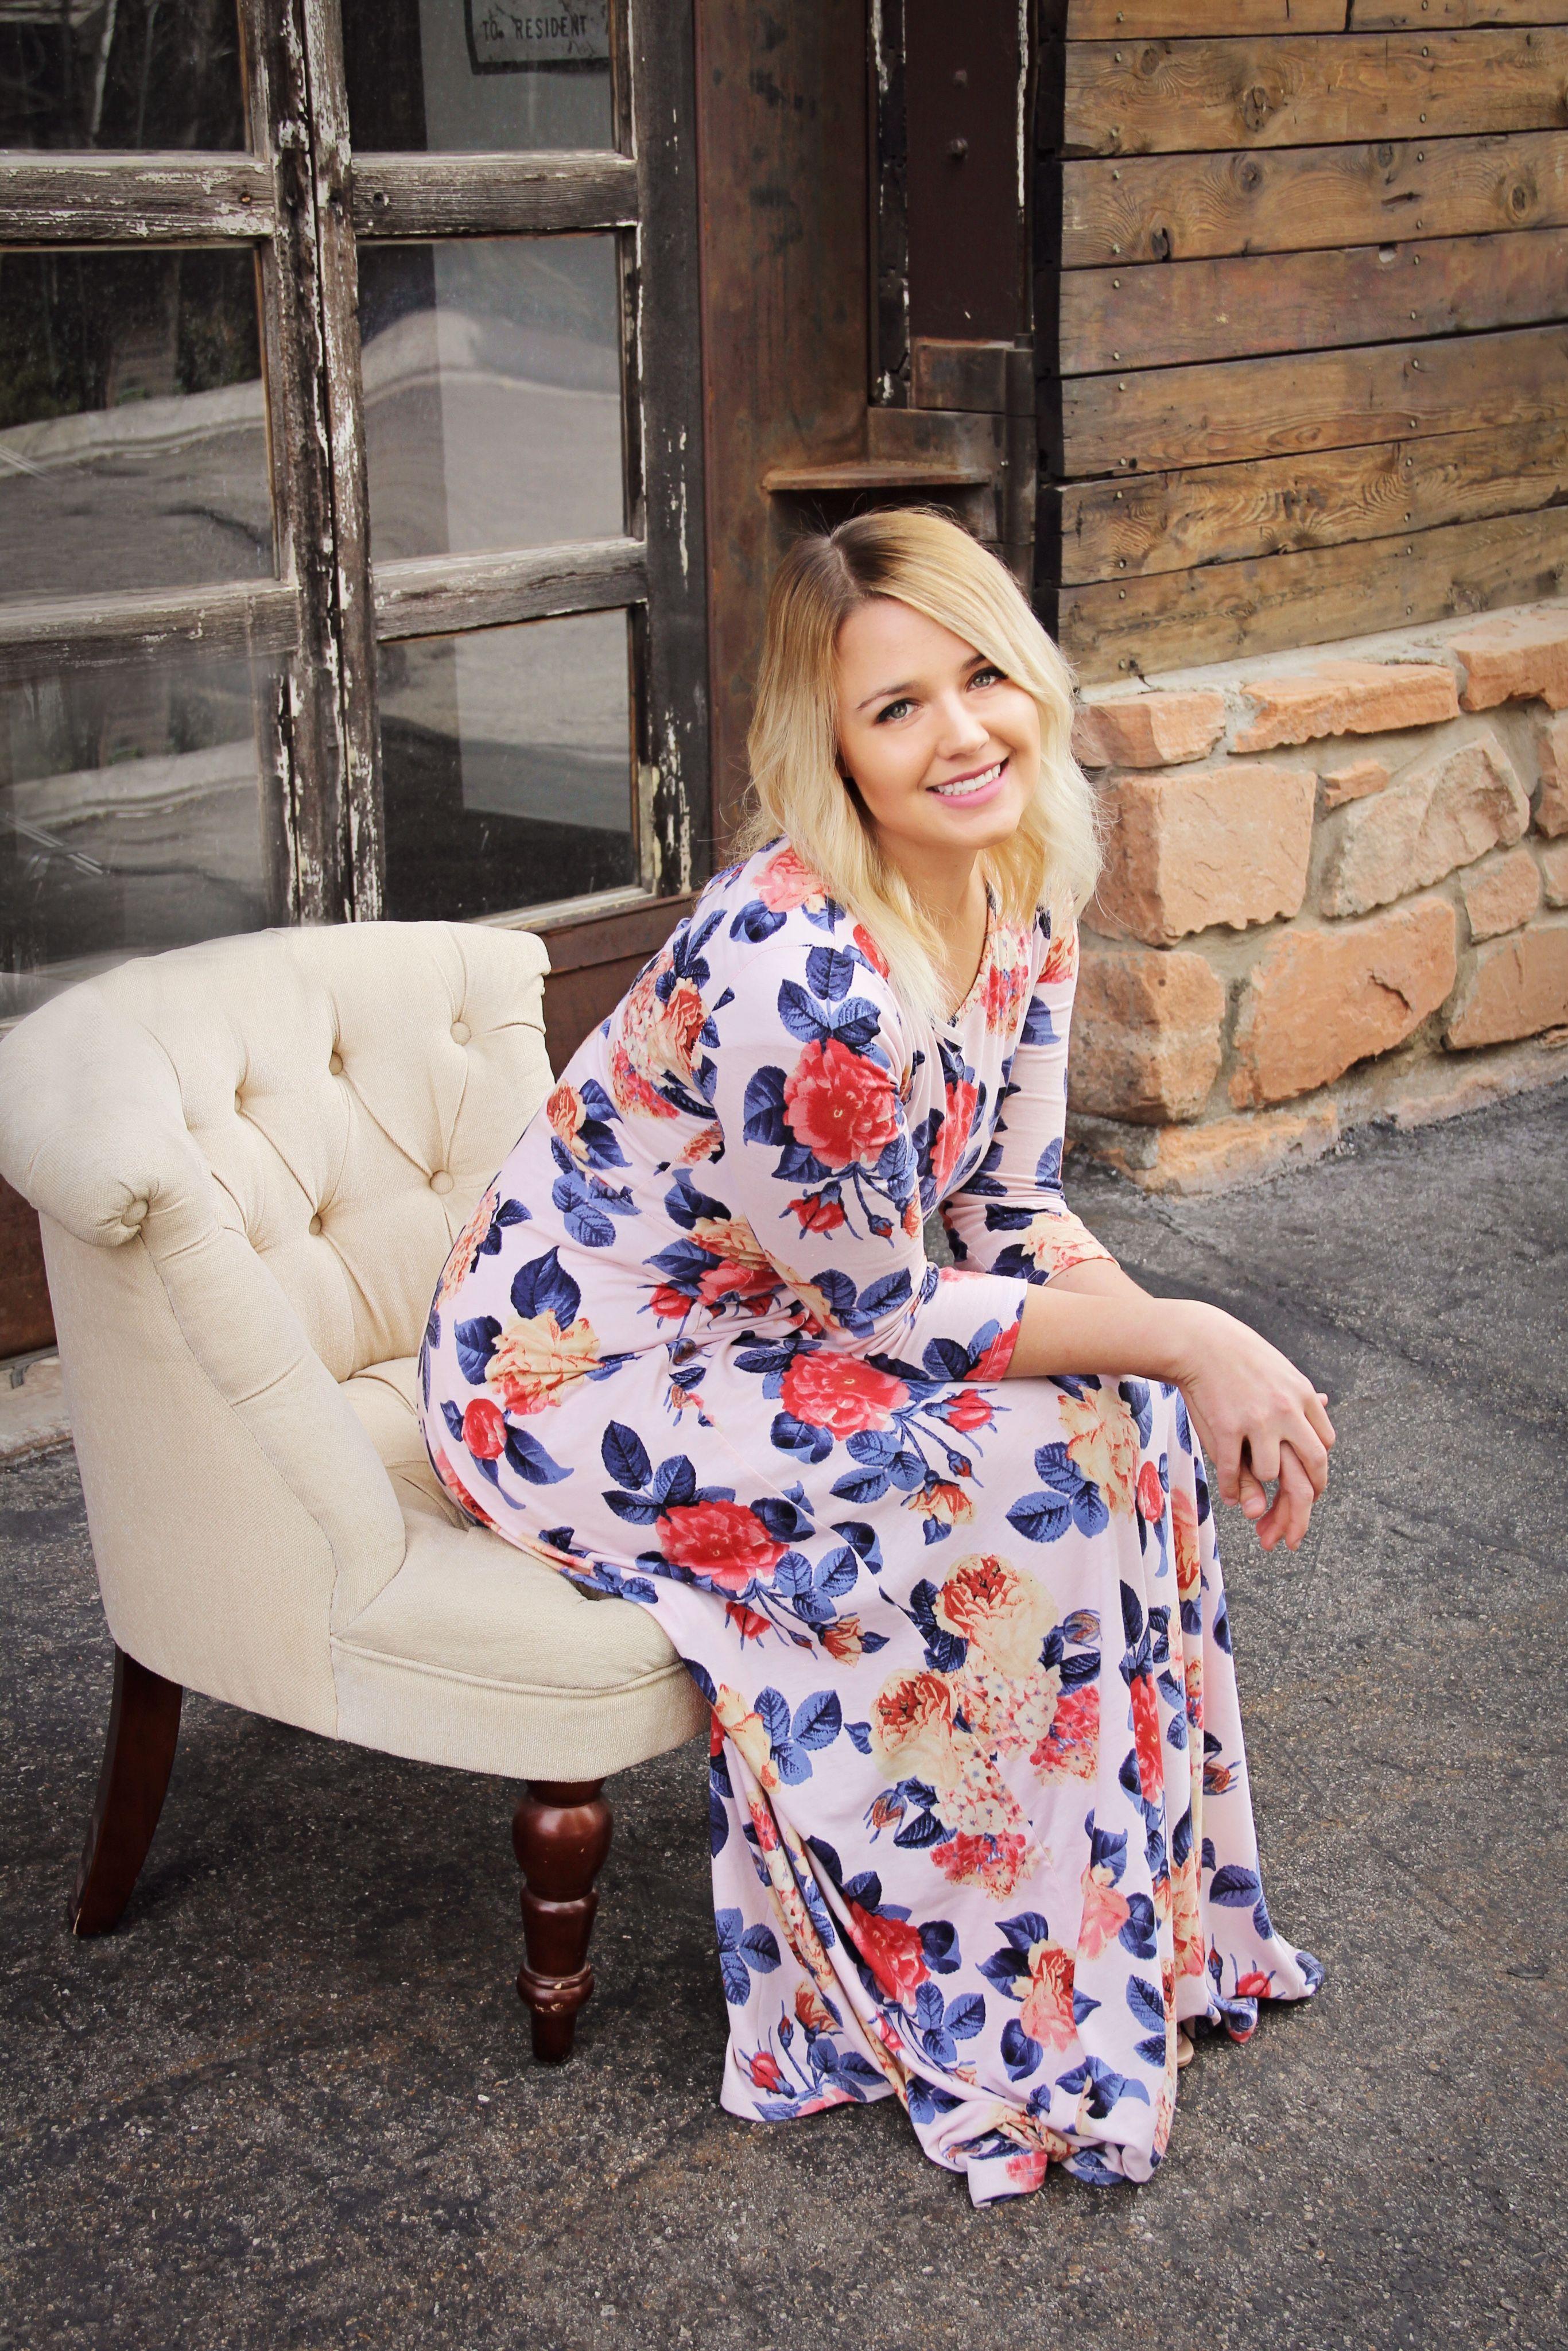 Brittany Gearheart graduated from LDSBCs interior design program